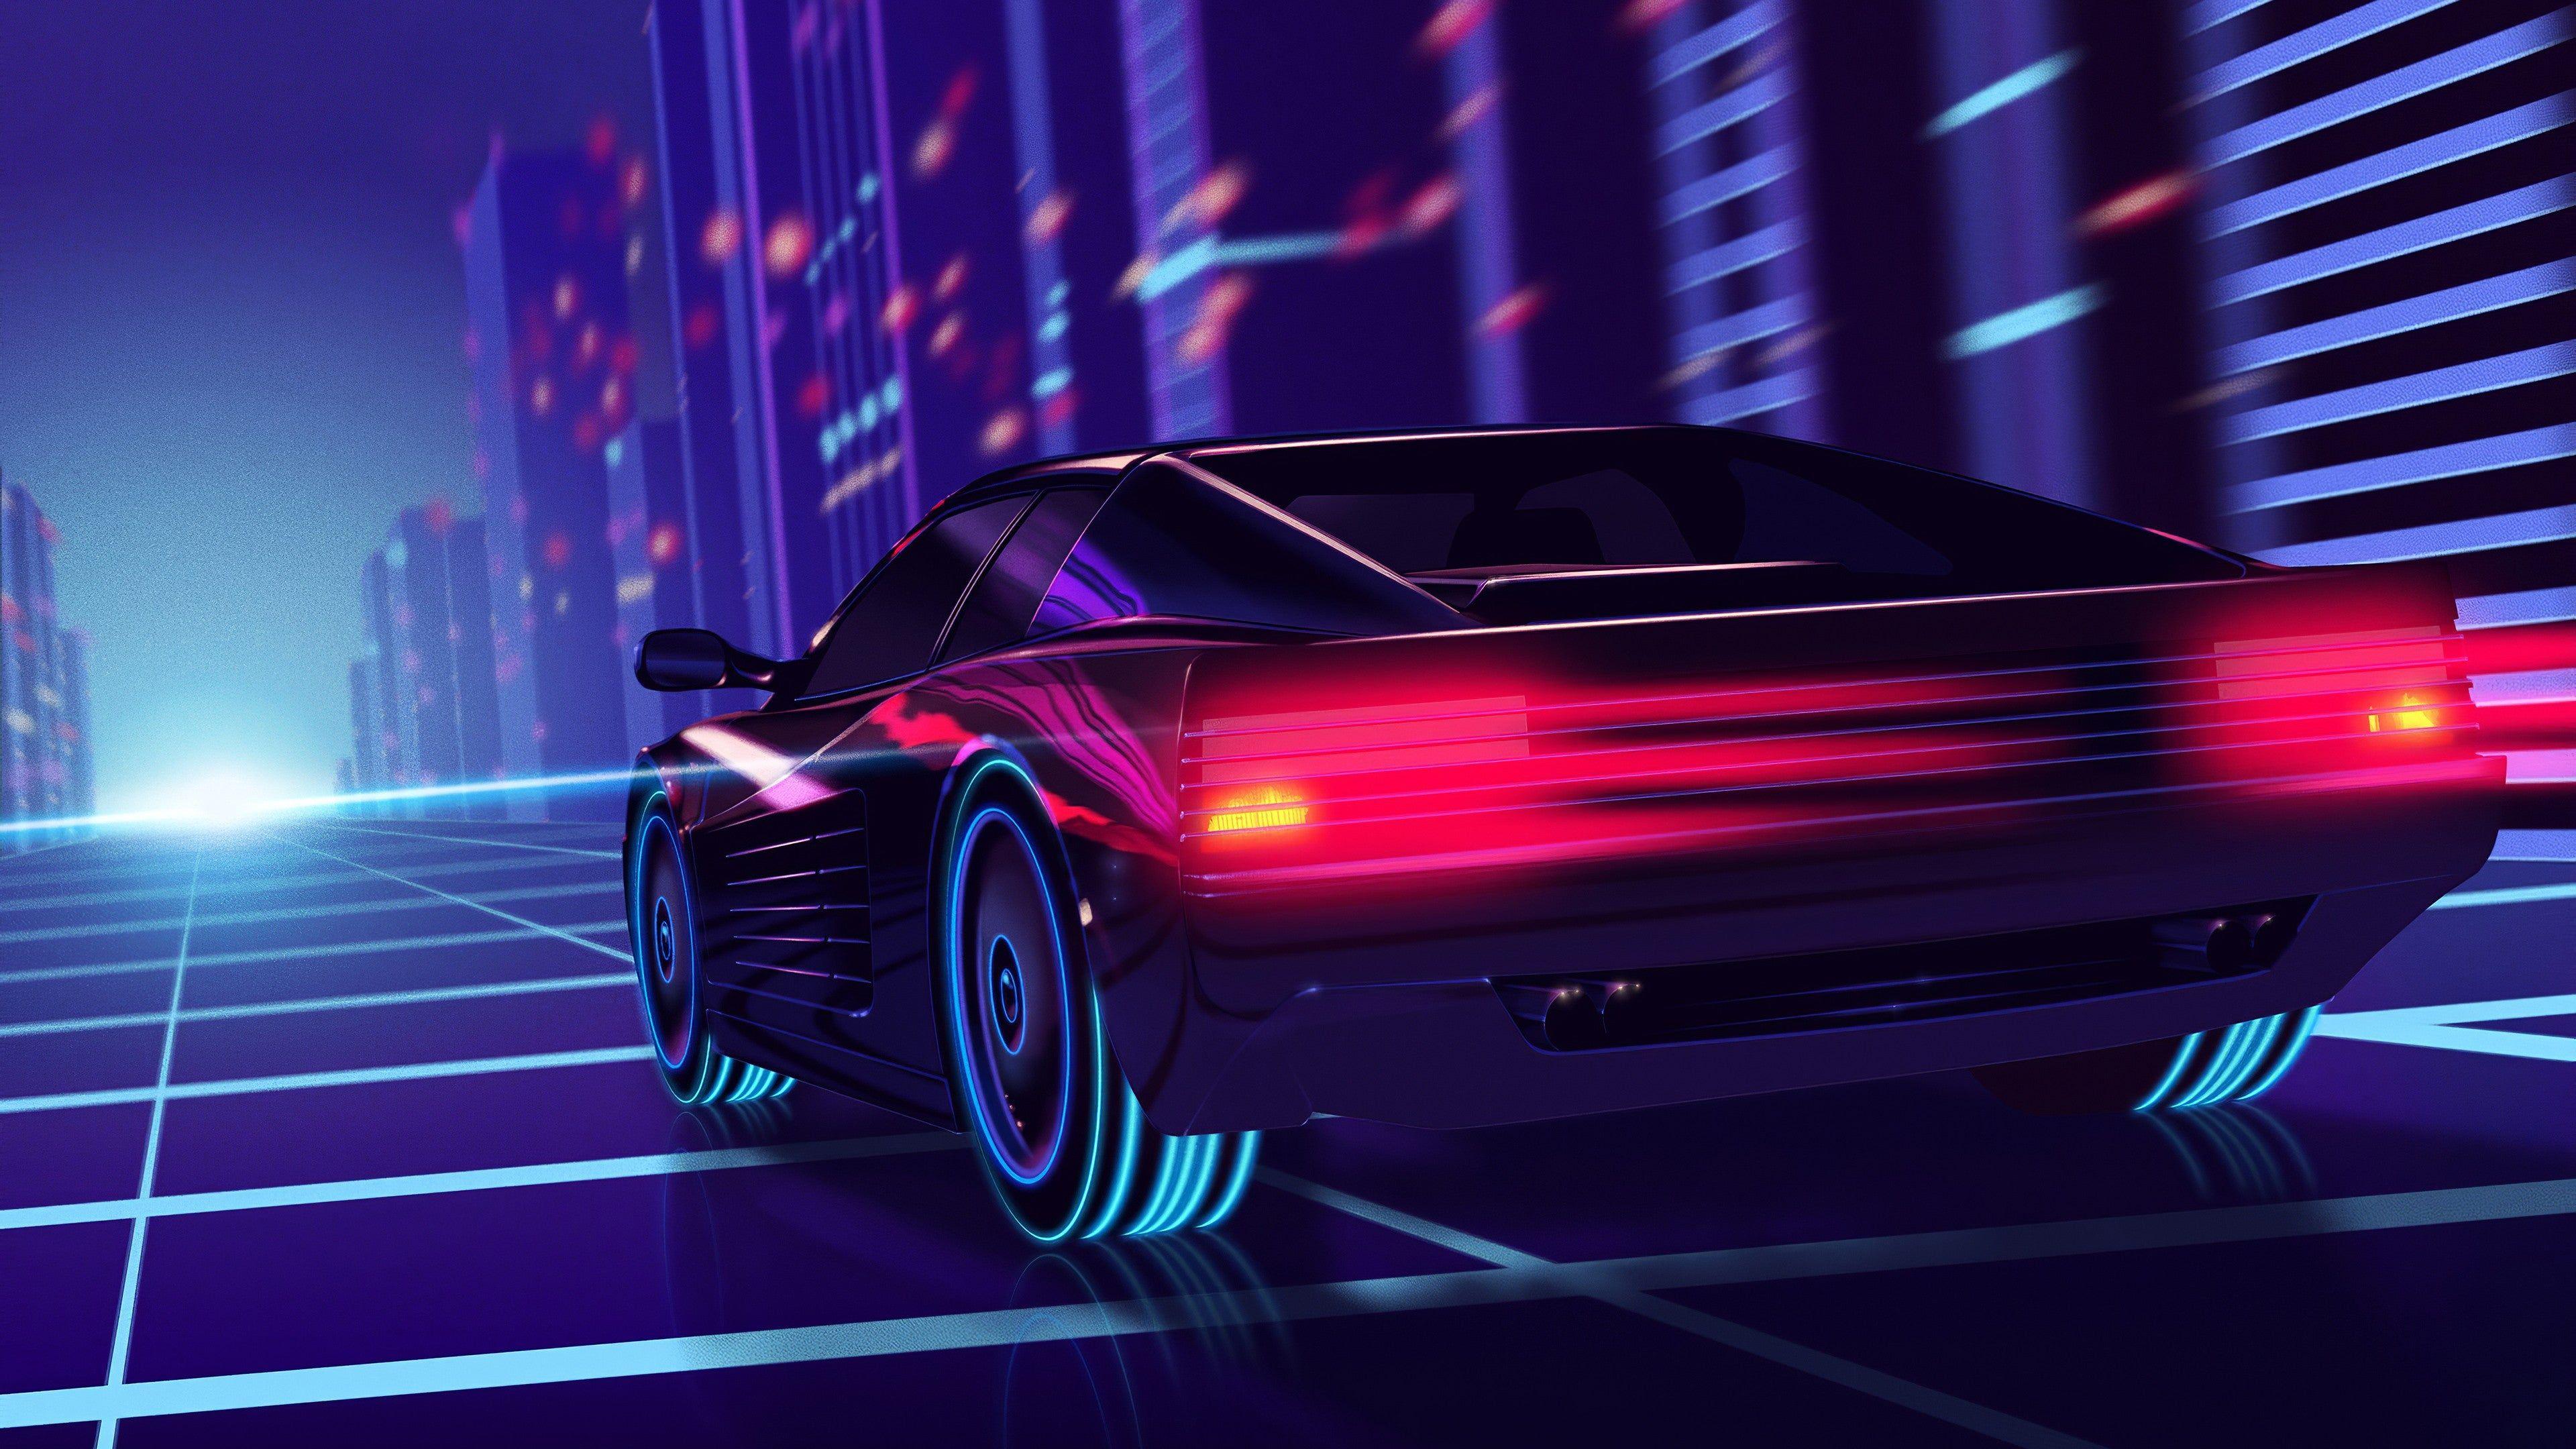 Retrowave Neon Racing 4k Wallpaper Computer Wallpaper Desktop Wallpapers Synthwave Ferrari Testarossa